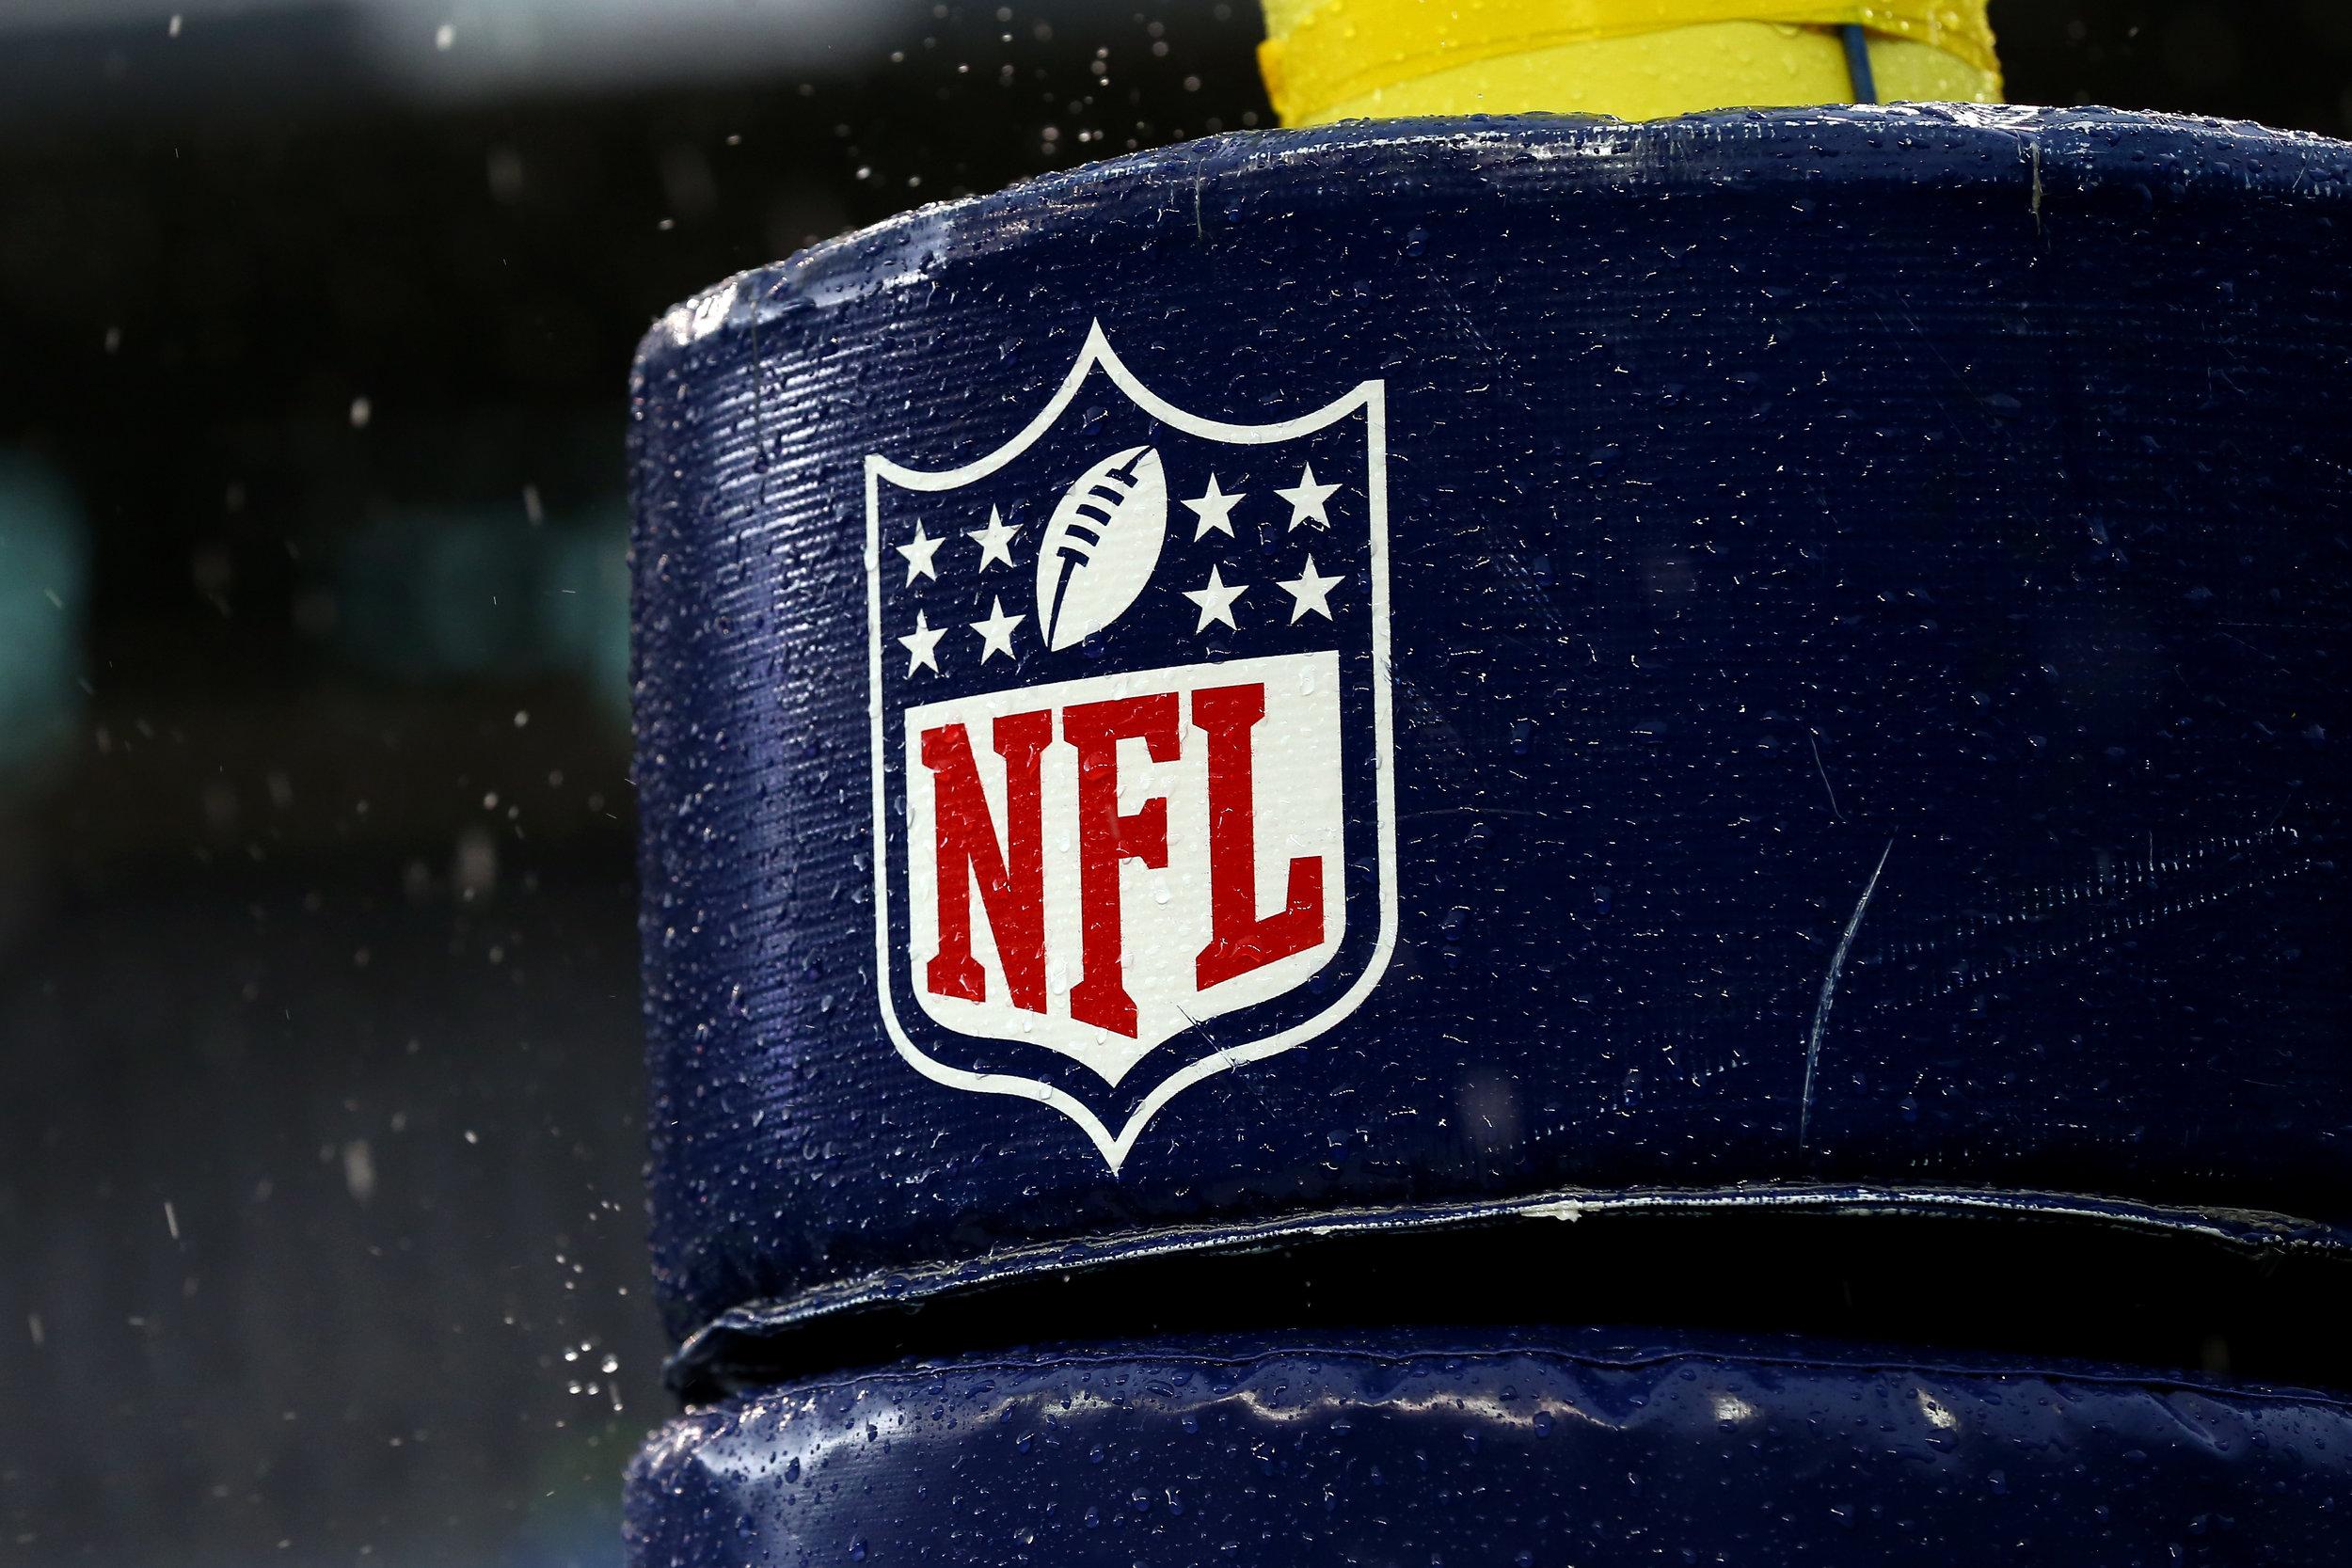 NFL | VERIZON